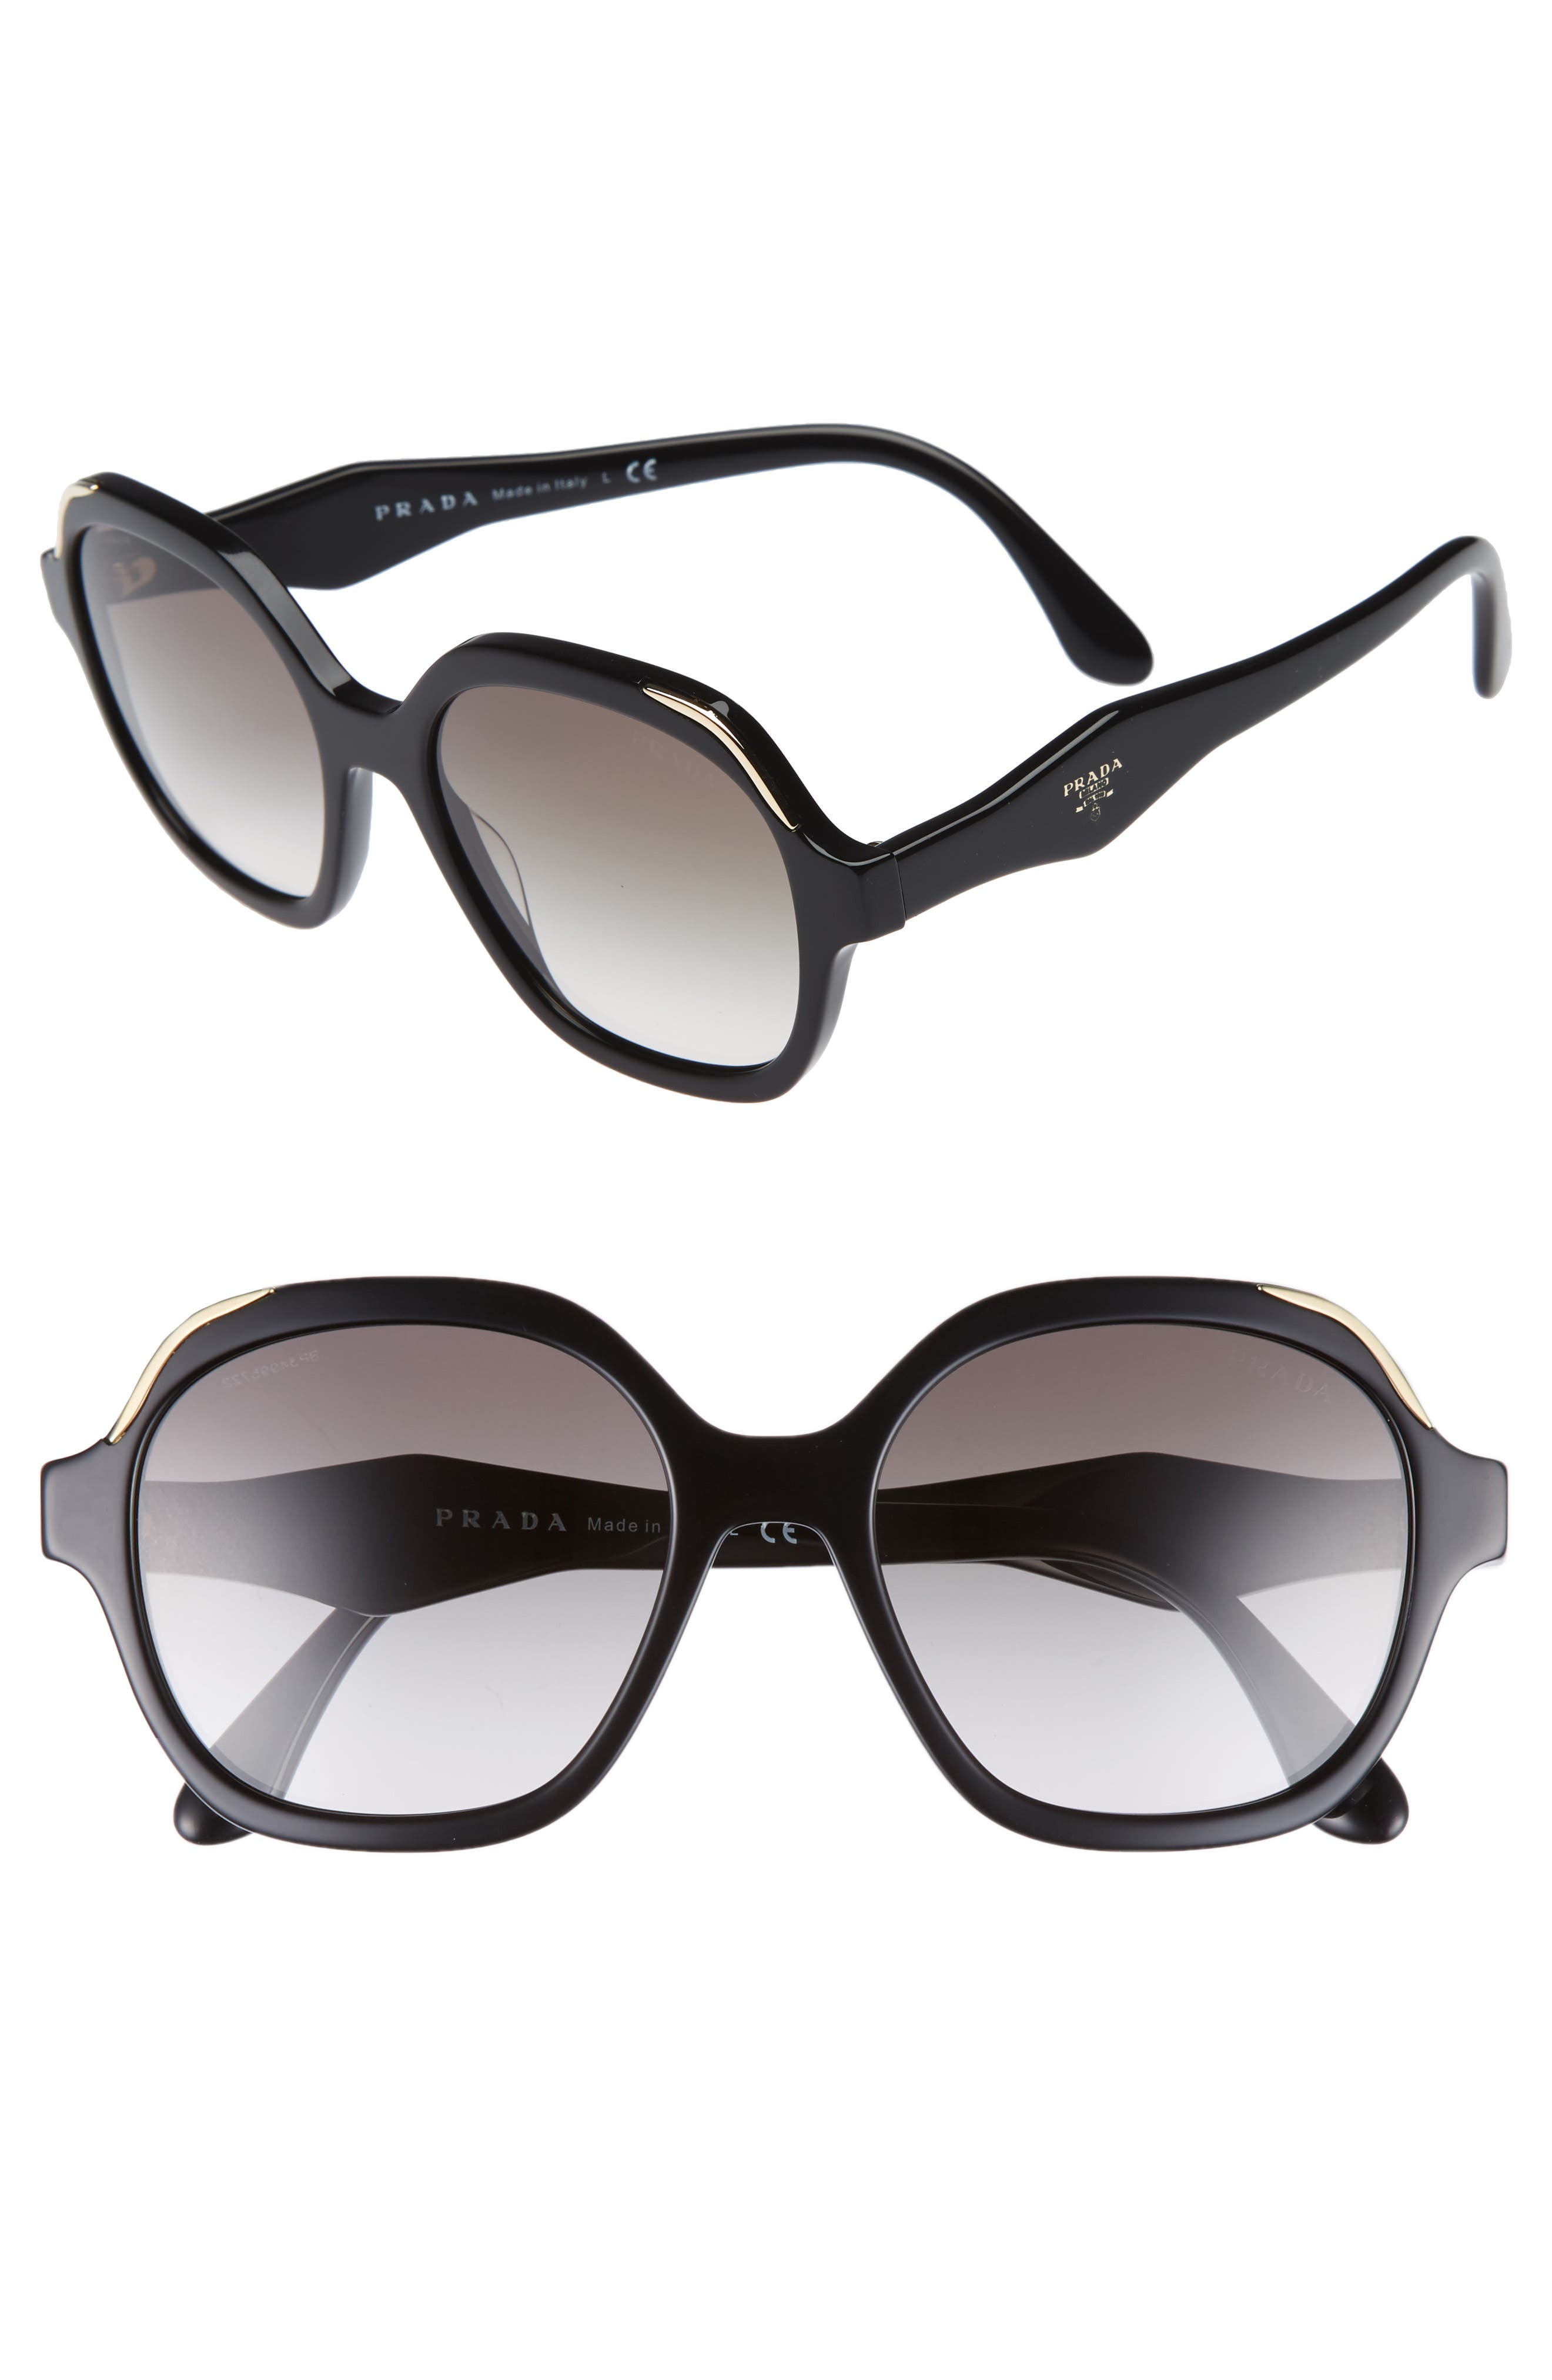 52mm Geometric Gradient Sunglasses,                         Main,                         color,